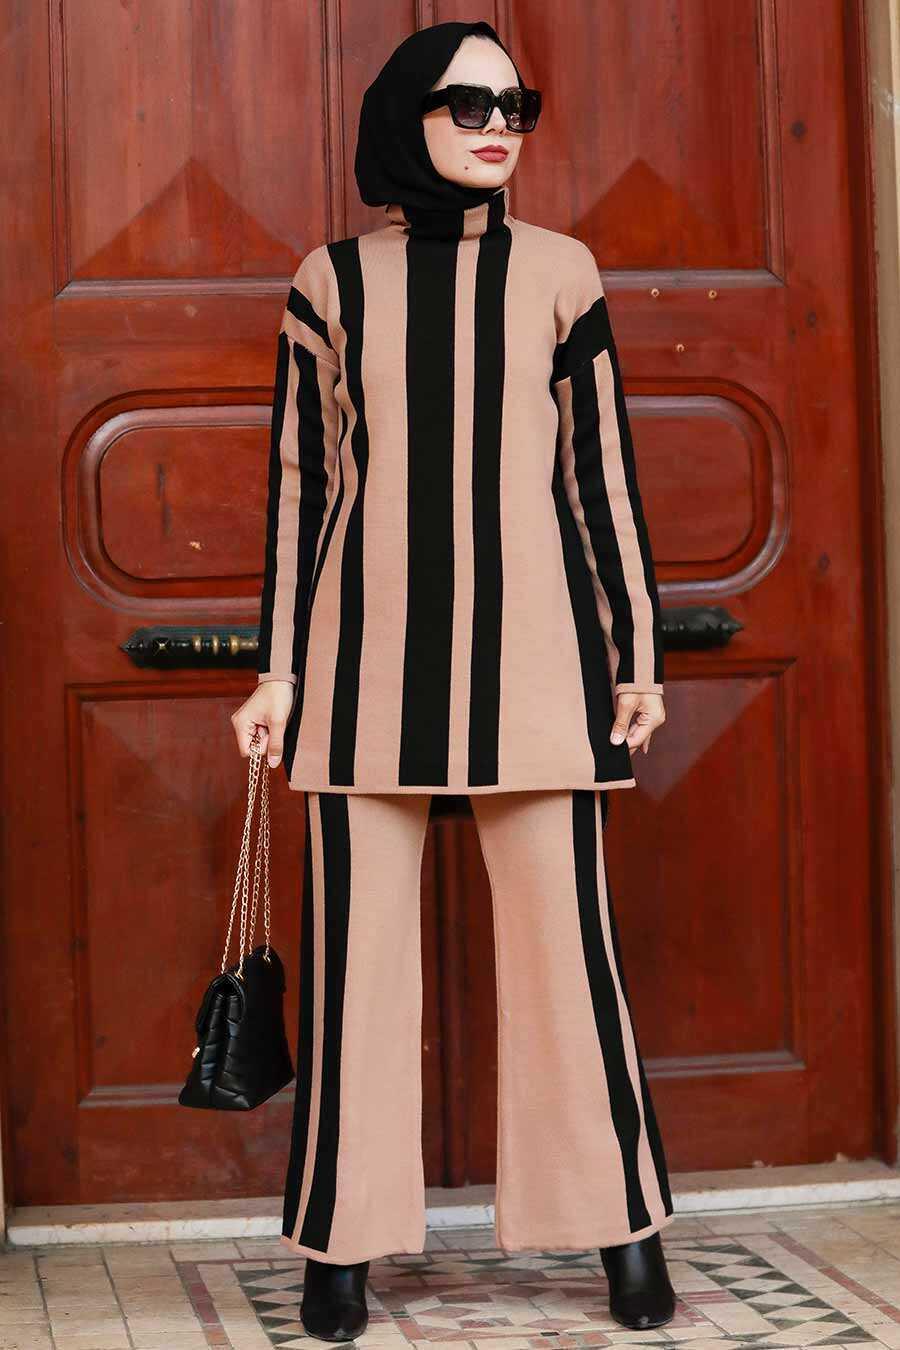 Biscuit Hijab Knitwear Suit Dress 3153BS